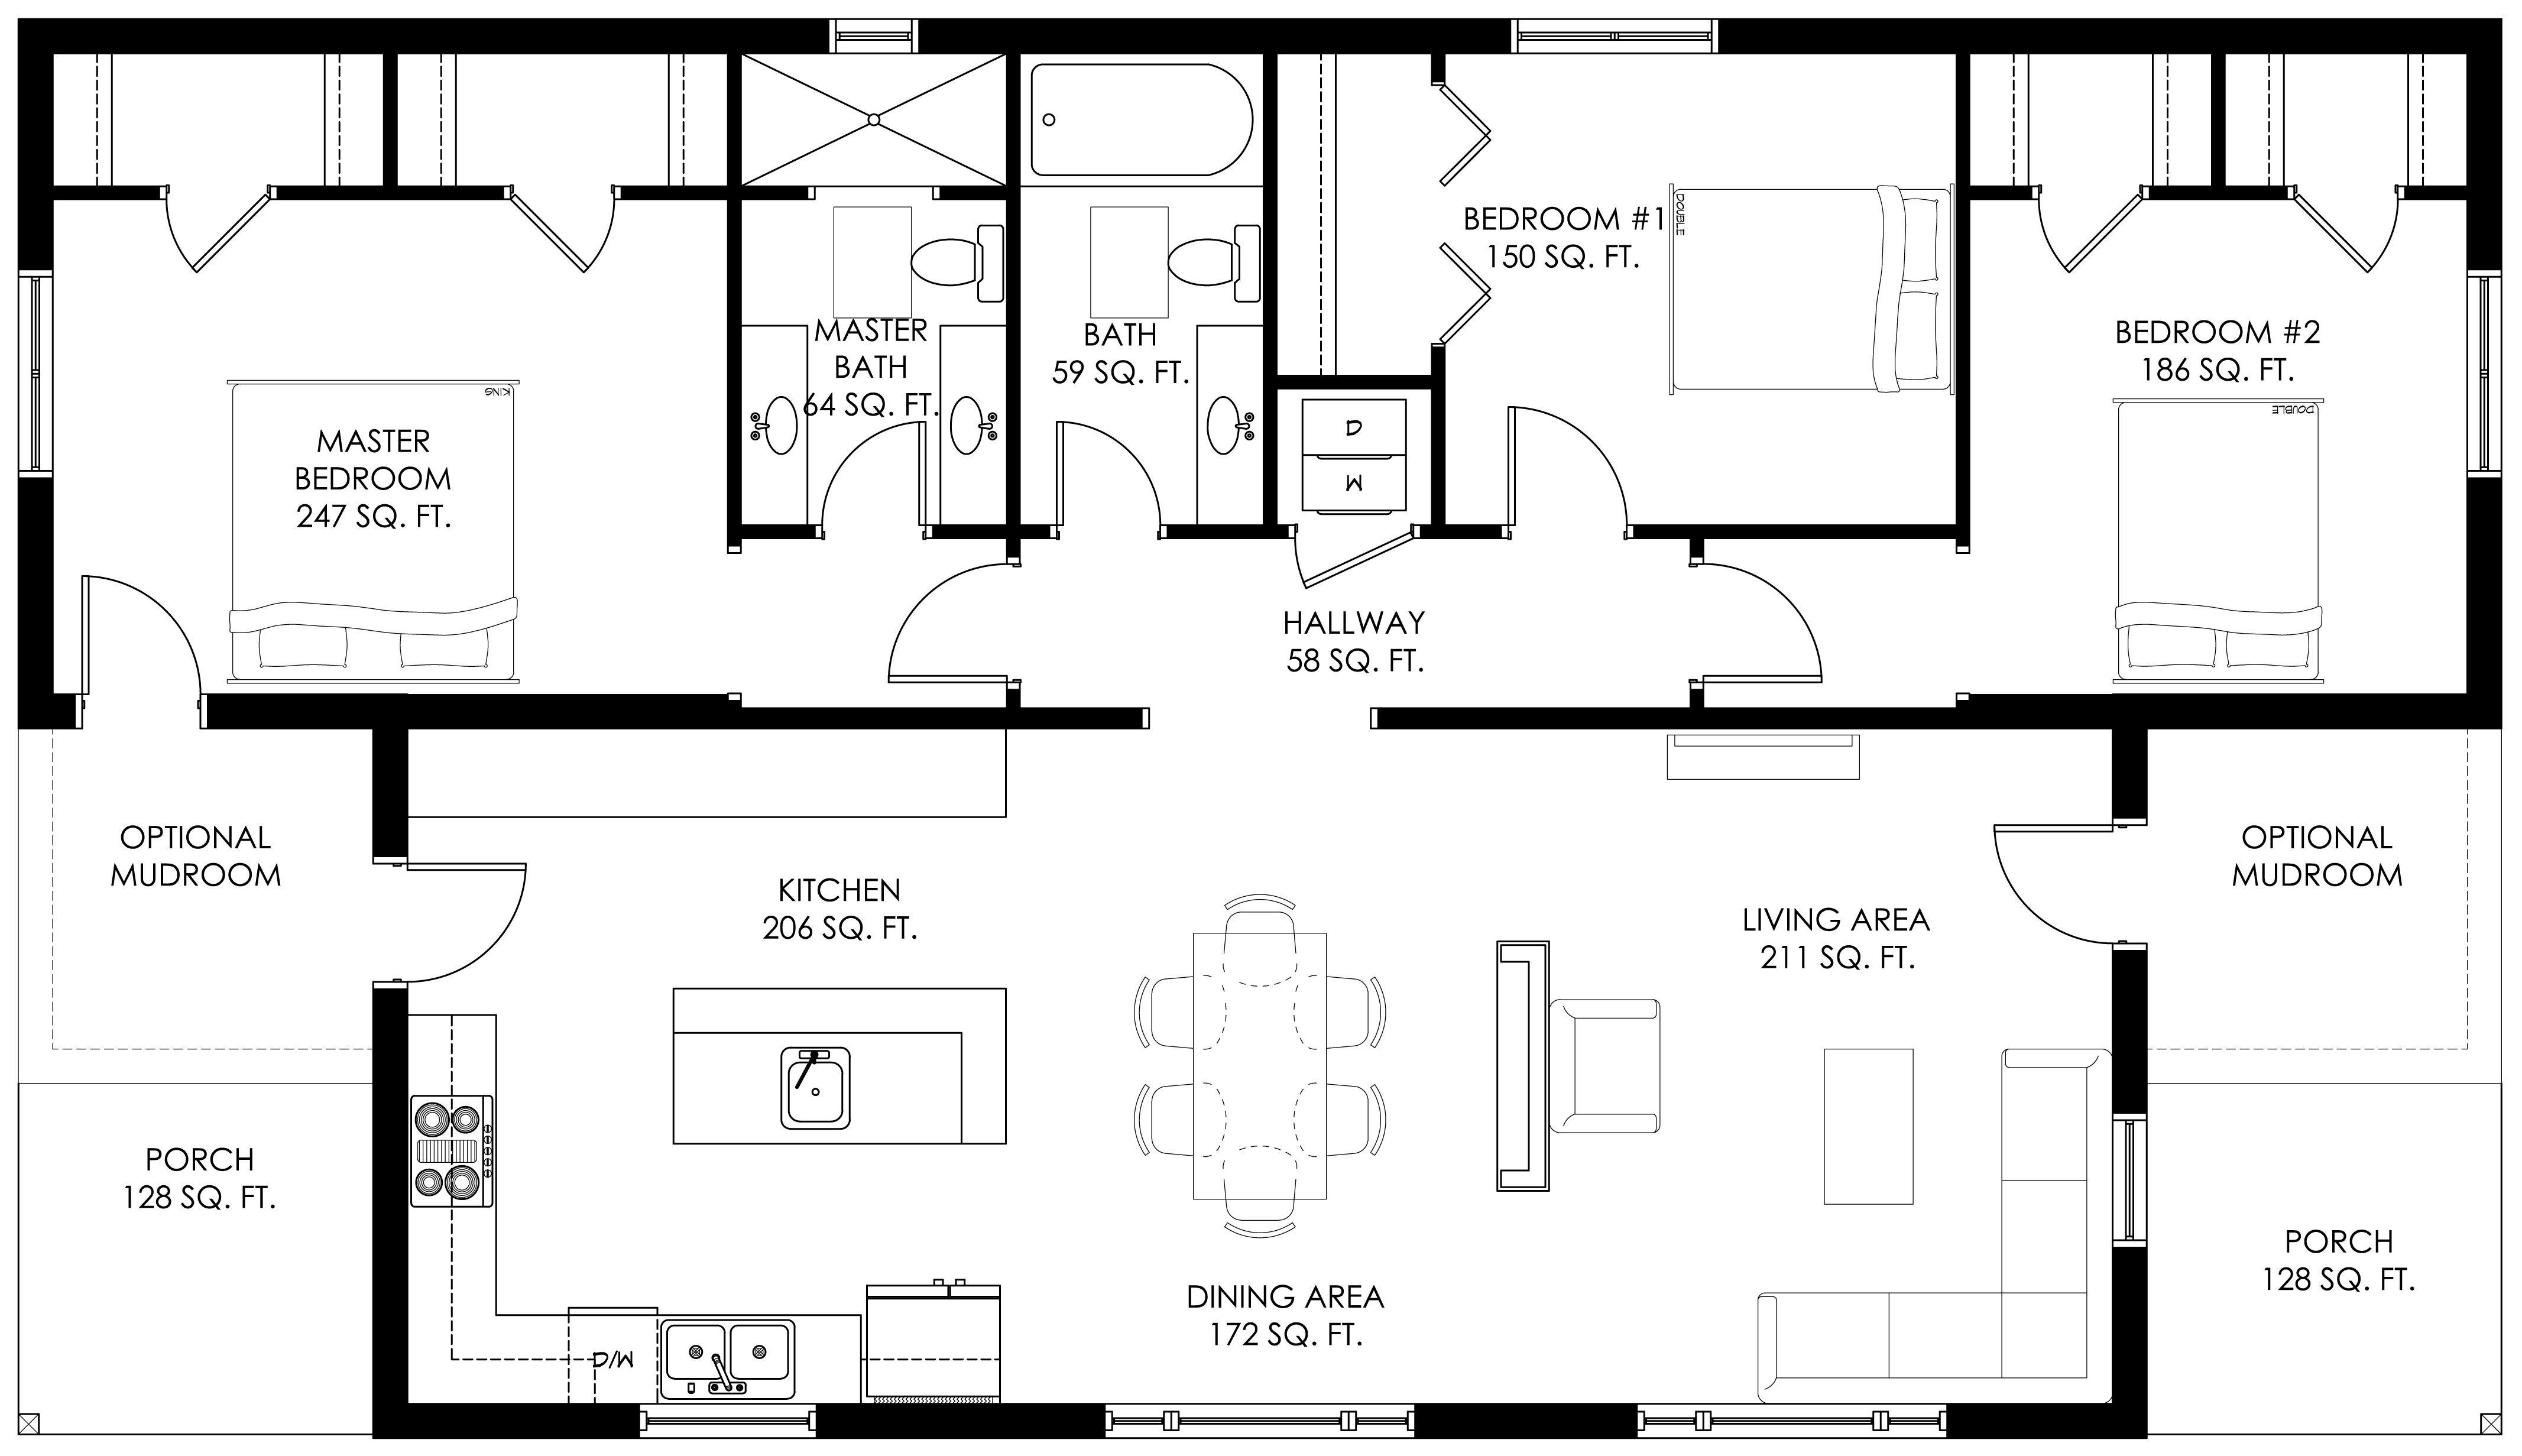 Modern Prefabricated Homes Net Zero Homes Ridgeline Deltec Homes Craftsman Bungalow House Plans Passive Solar Homes House Plans